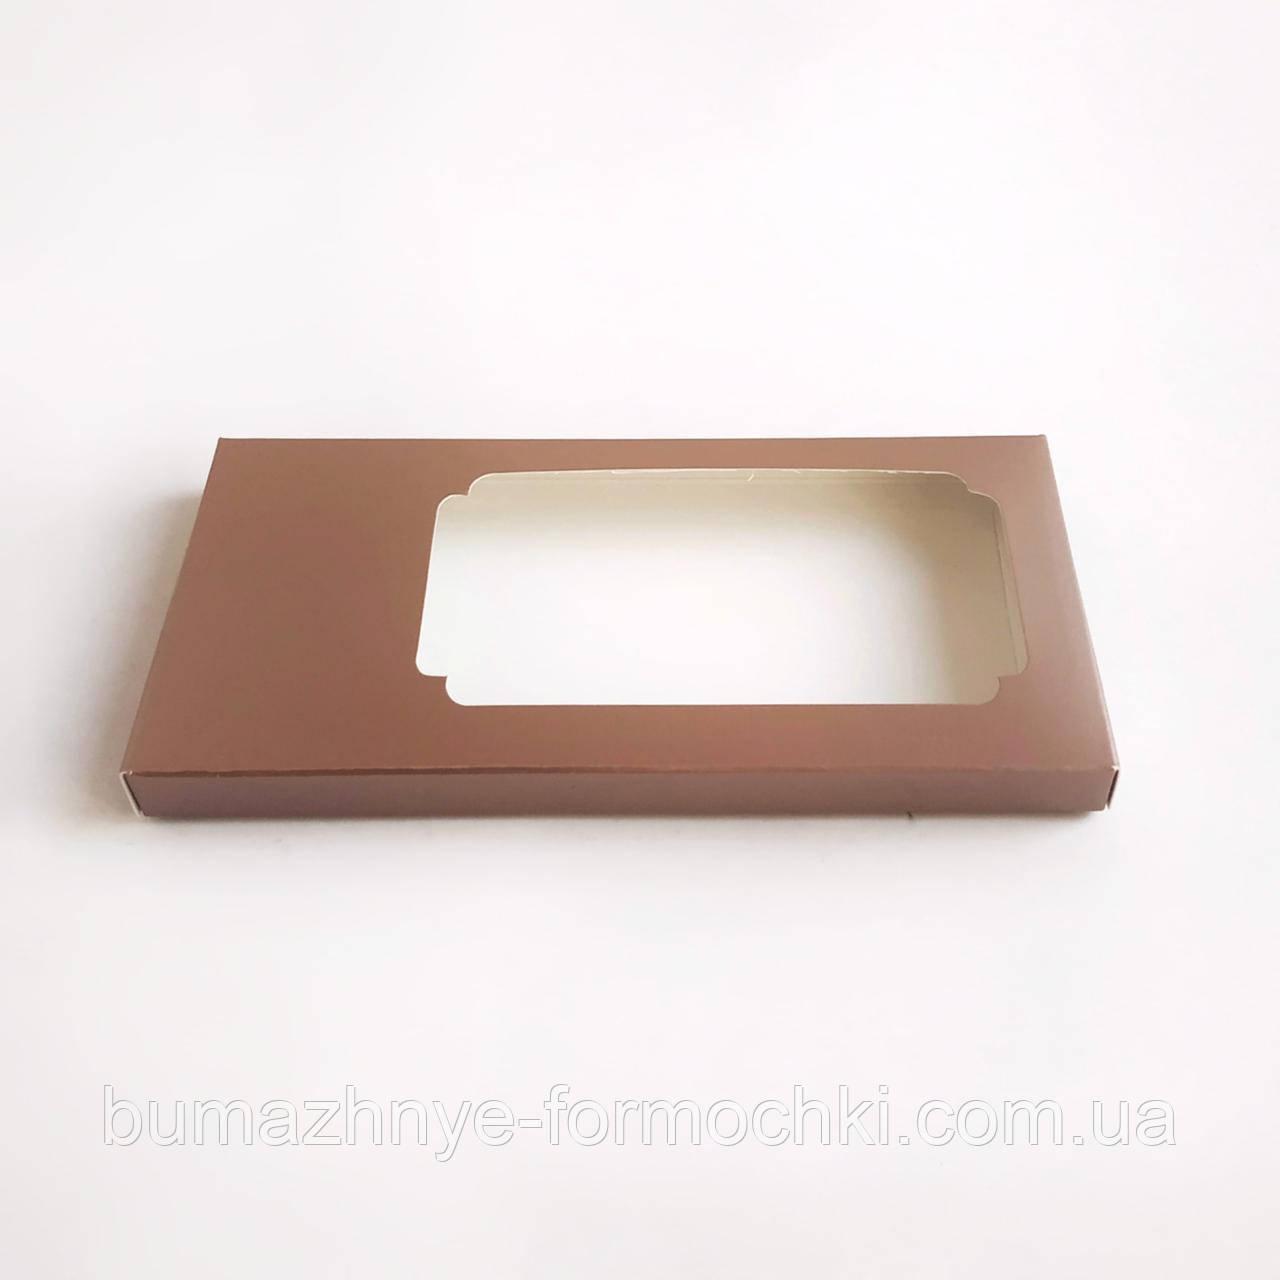 Коробка для шоколада, коричневый металлик, 160х80х17 мм